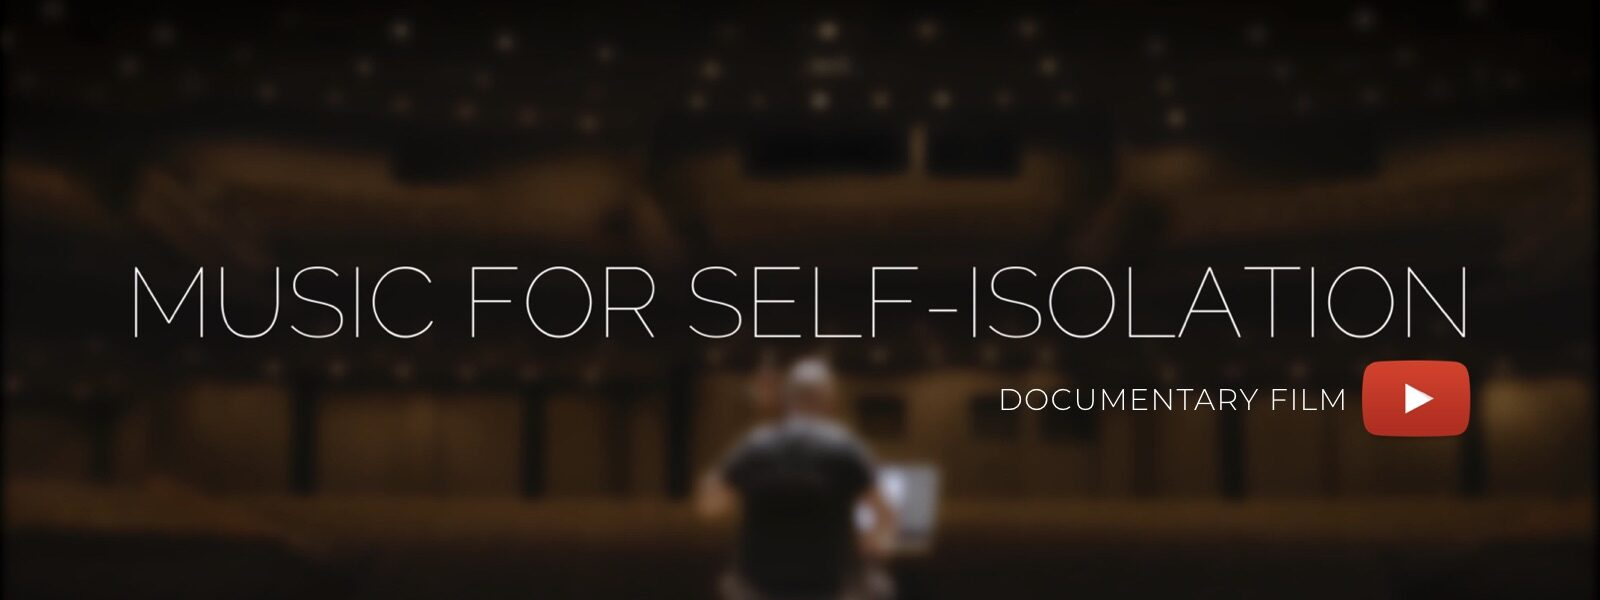 Music for Self-Isolation: Film